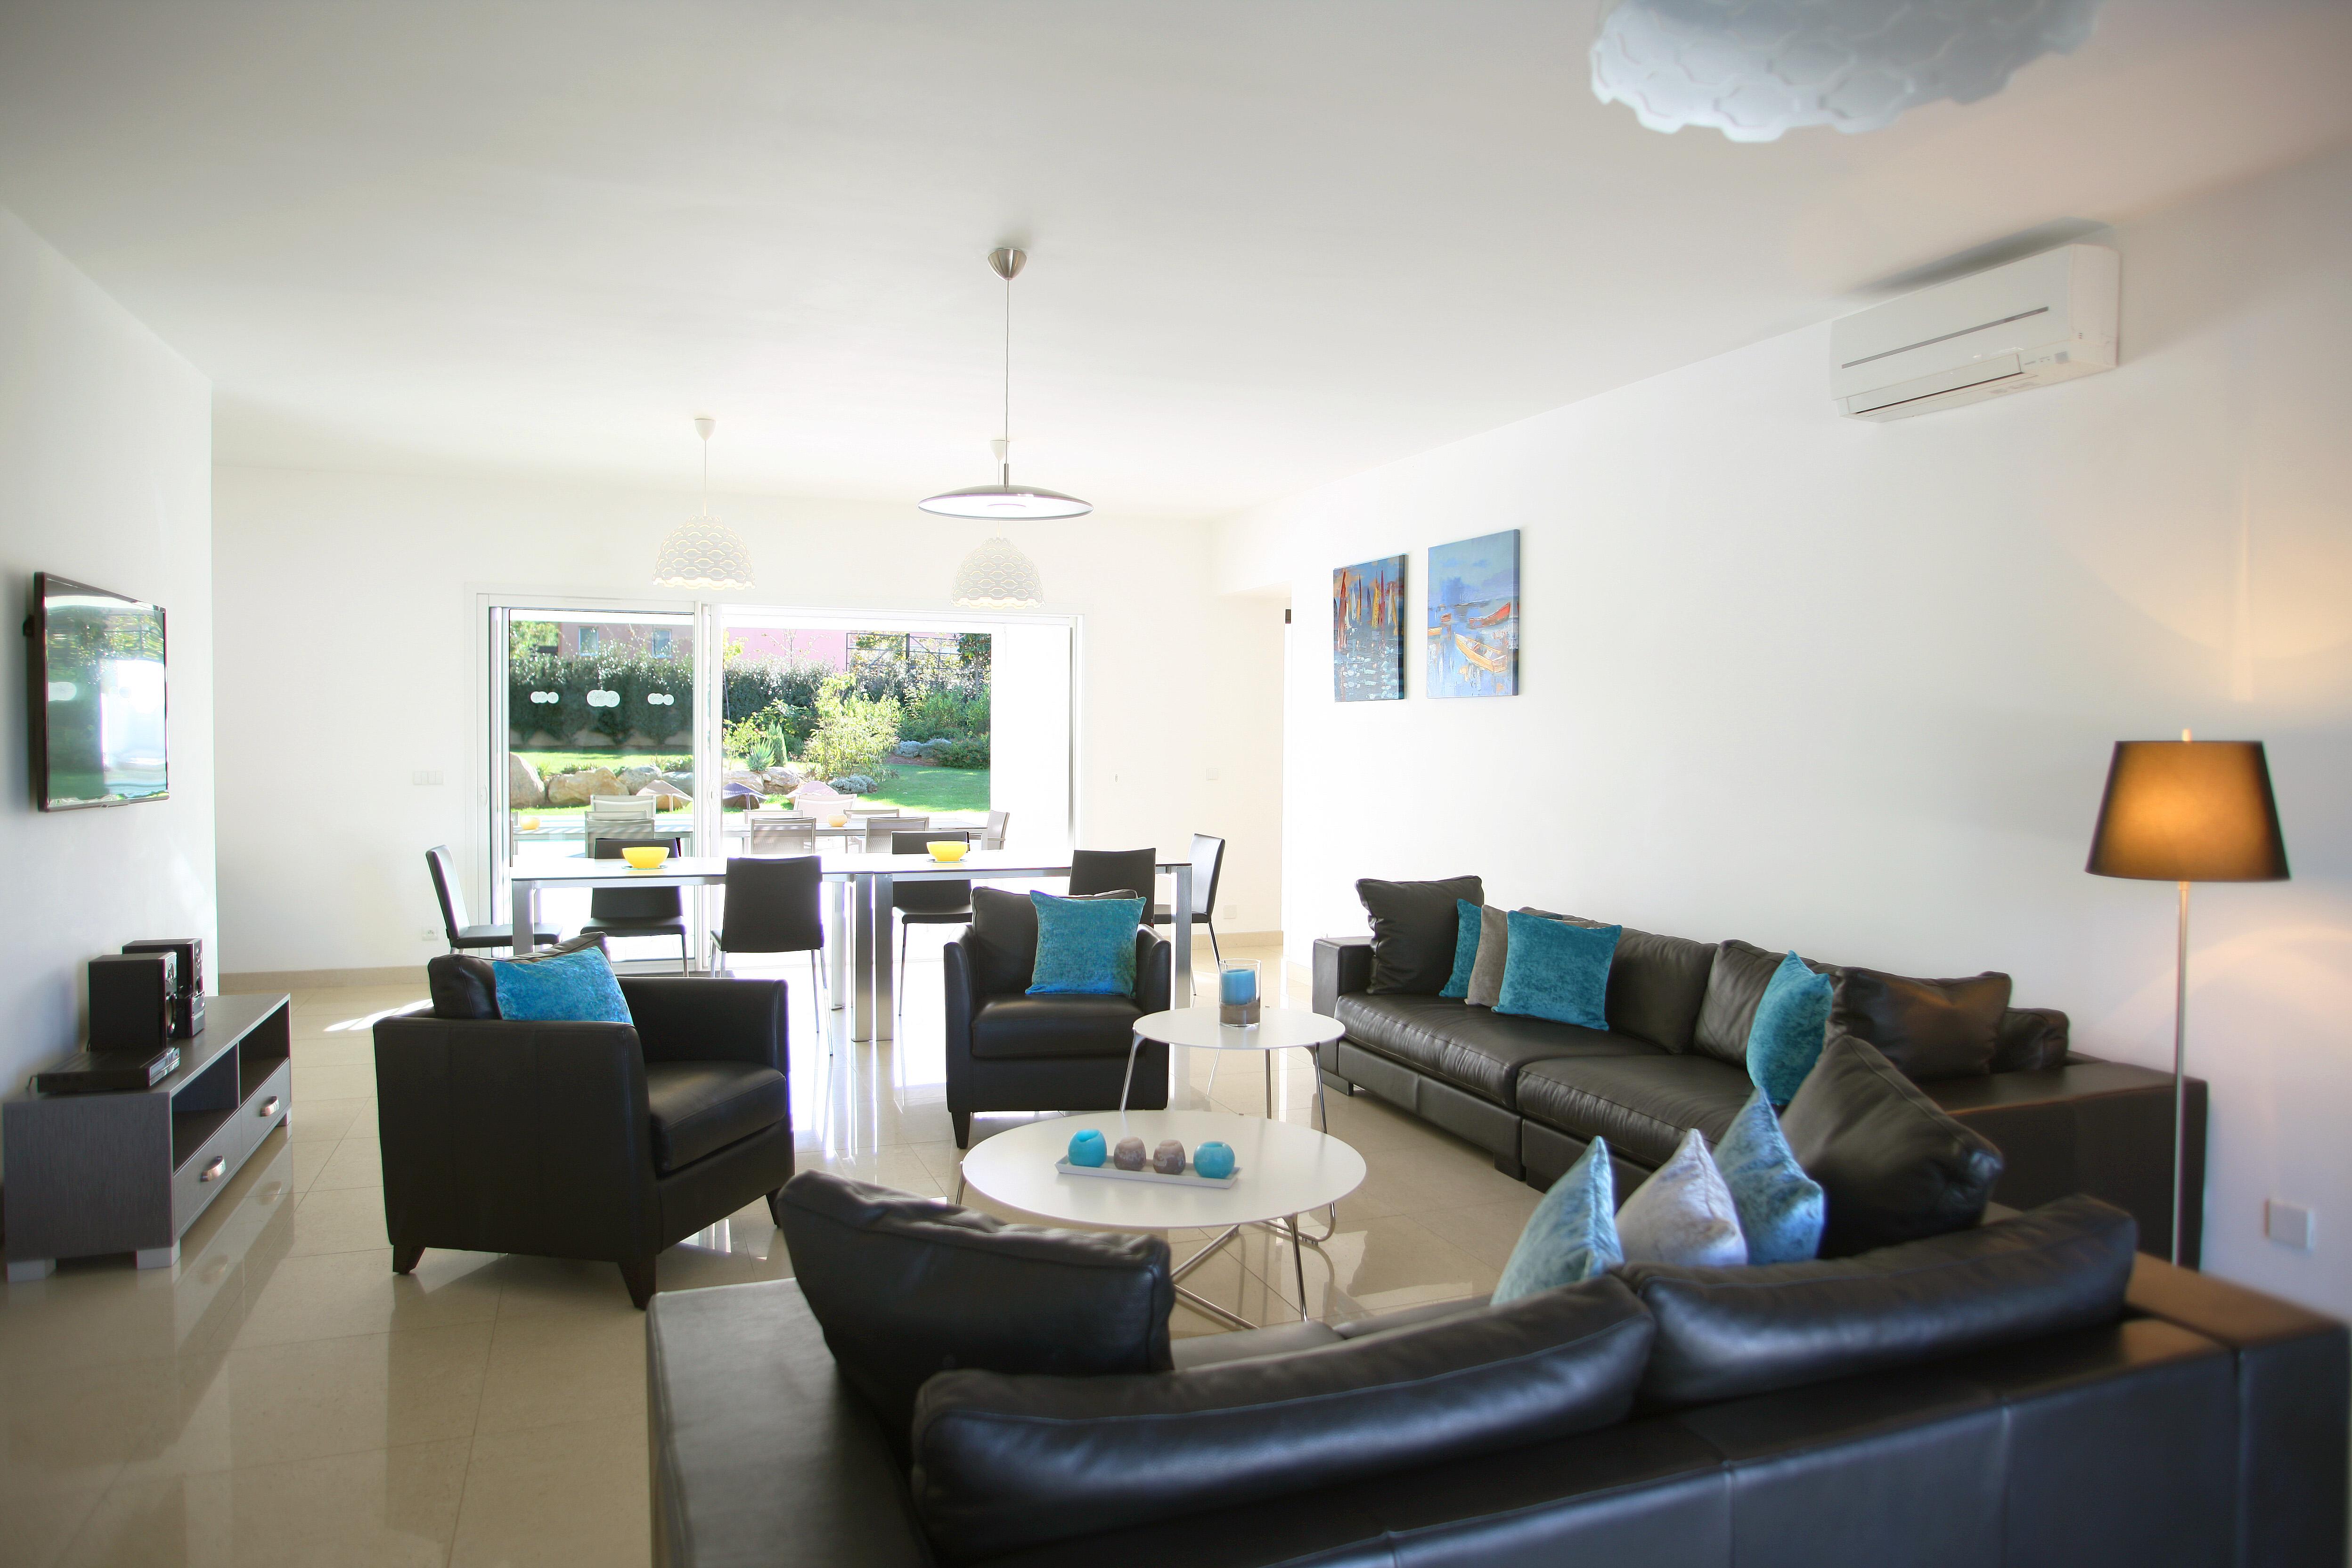 Calvi Villa Vacation Rentals Private Pool up 14 guests in Corsica[....]